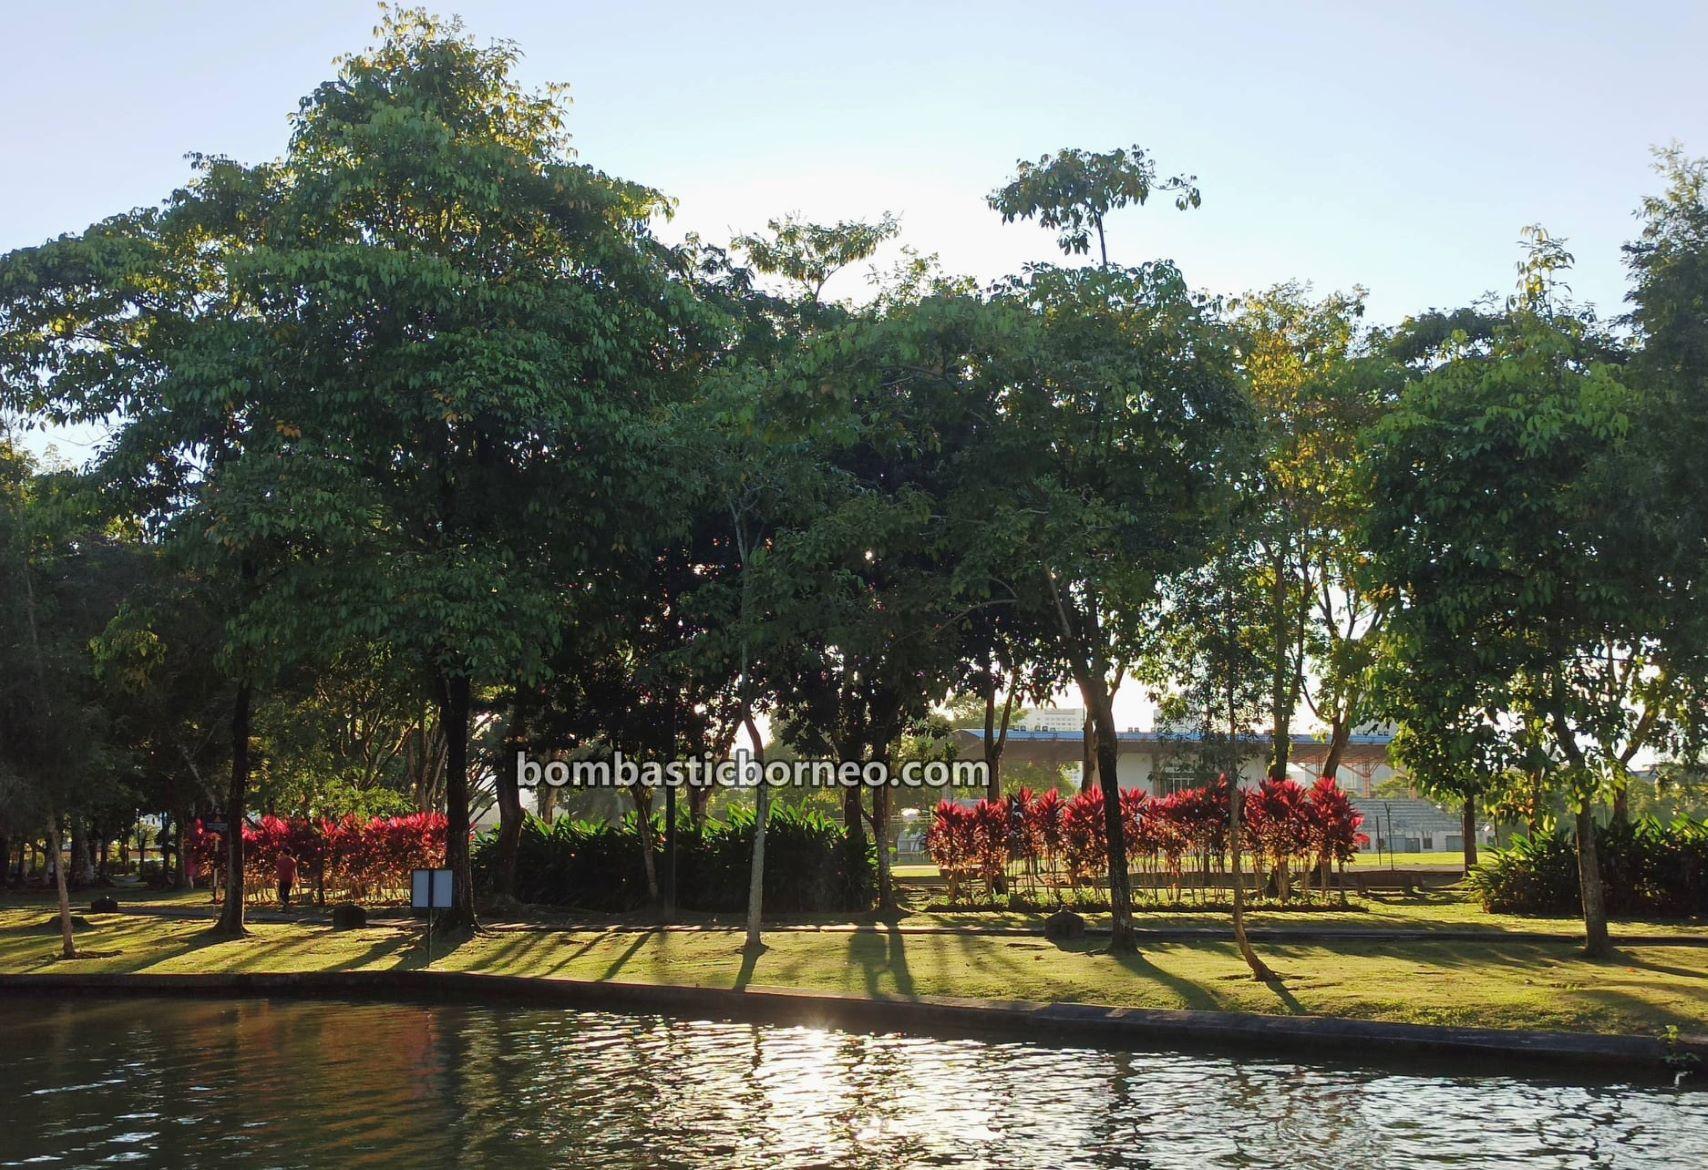 Kuching South City Council, garden, recreational park, jogging, outdoor, exercise, destination, Sarawak, Malaysia, Tourism, tourist attraction, travel local, 婆罗洲砂拉越游踪, 古晋南市公园, 跑步运动旅游景点